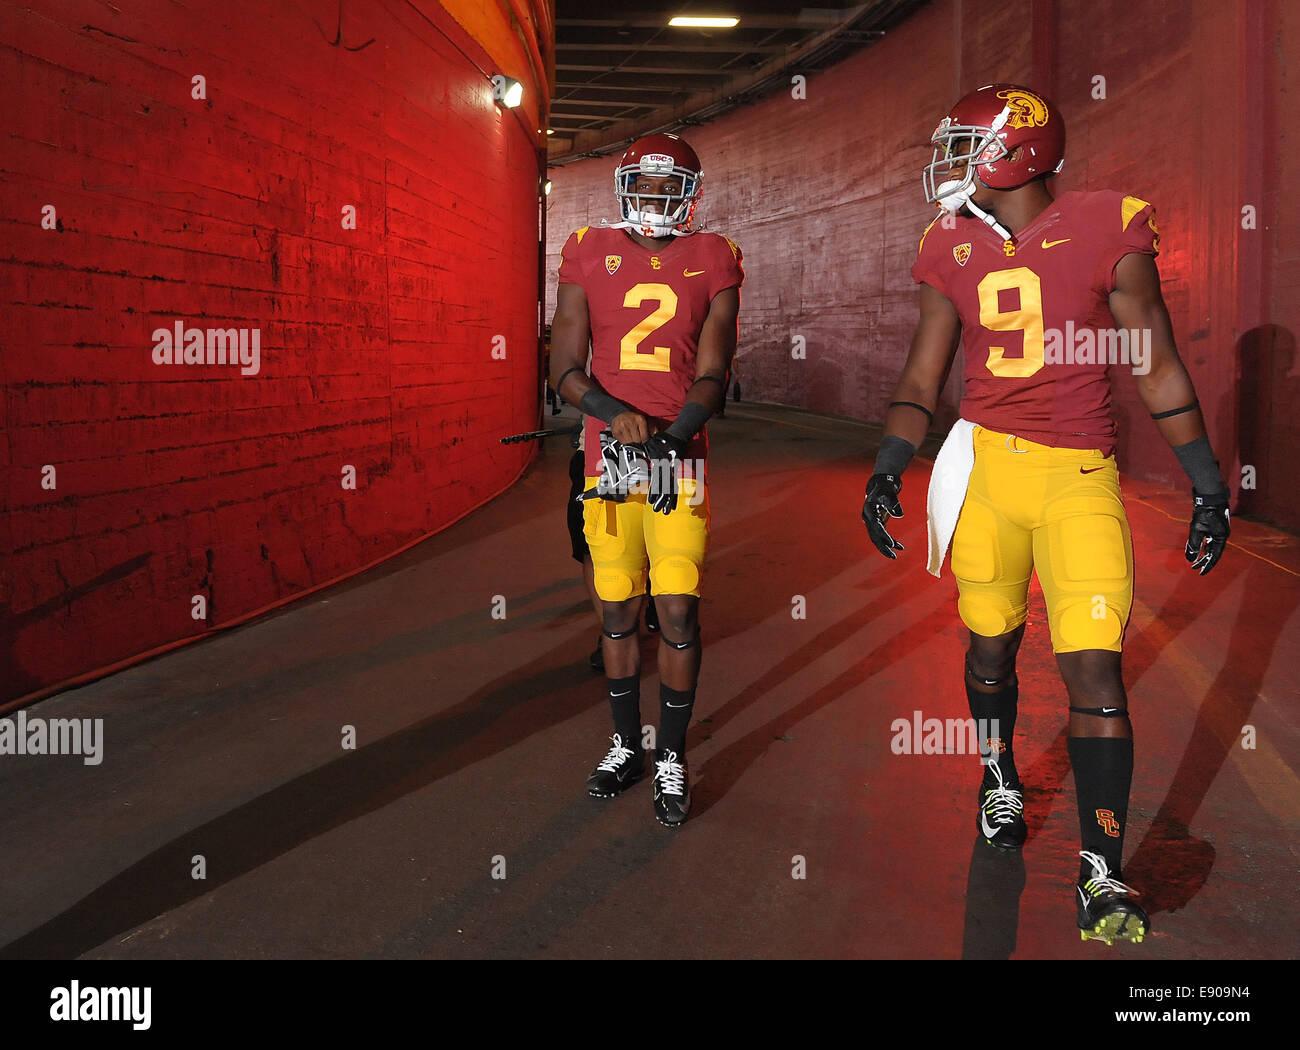 newest 9256e 4fc68 August 30, 2014, Los Angeles, CA...USC Trojans wide receiver ...